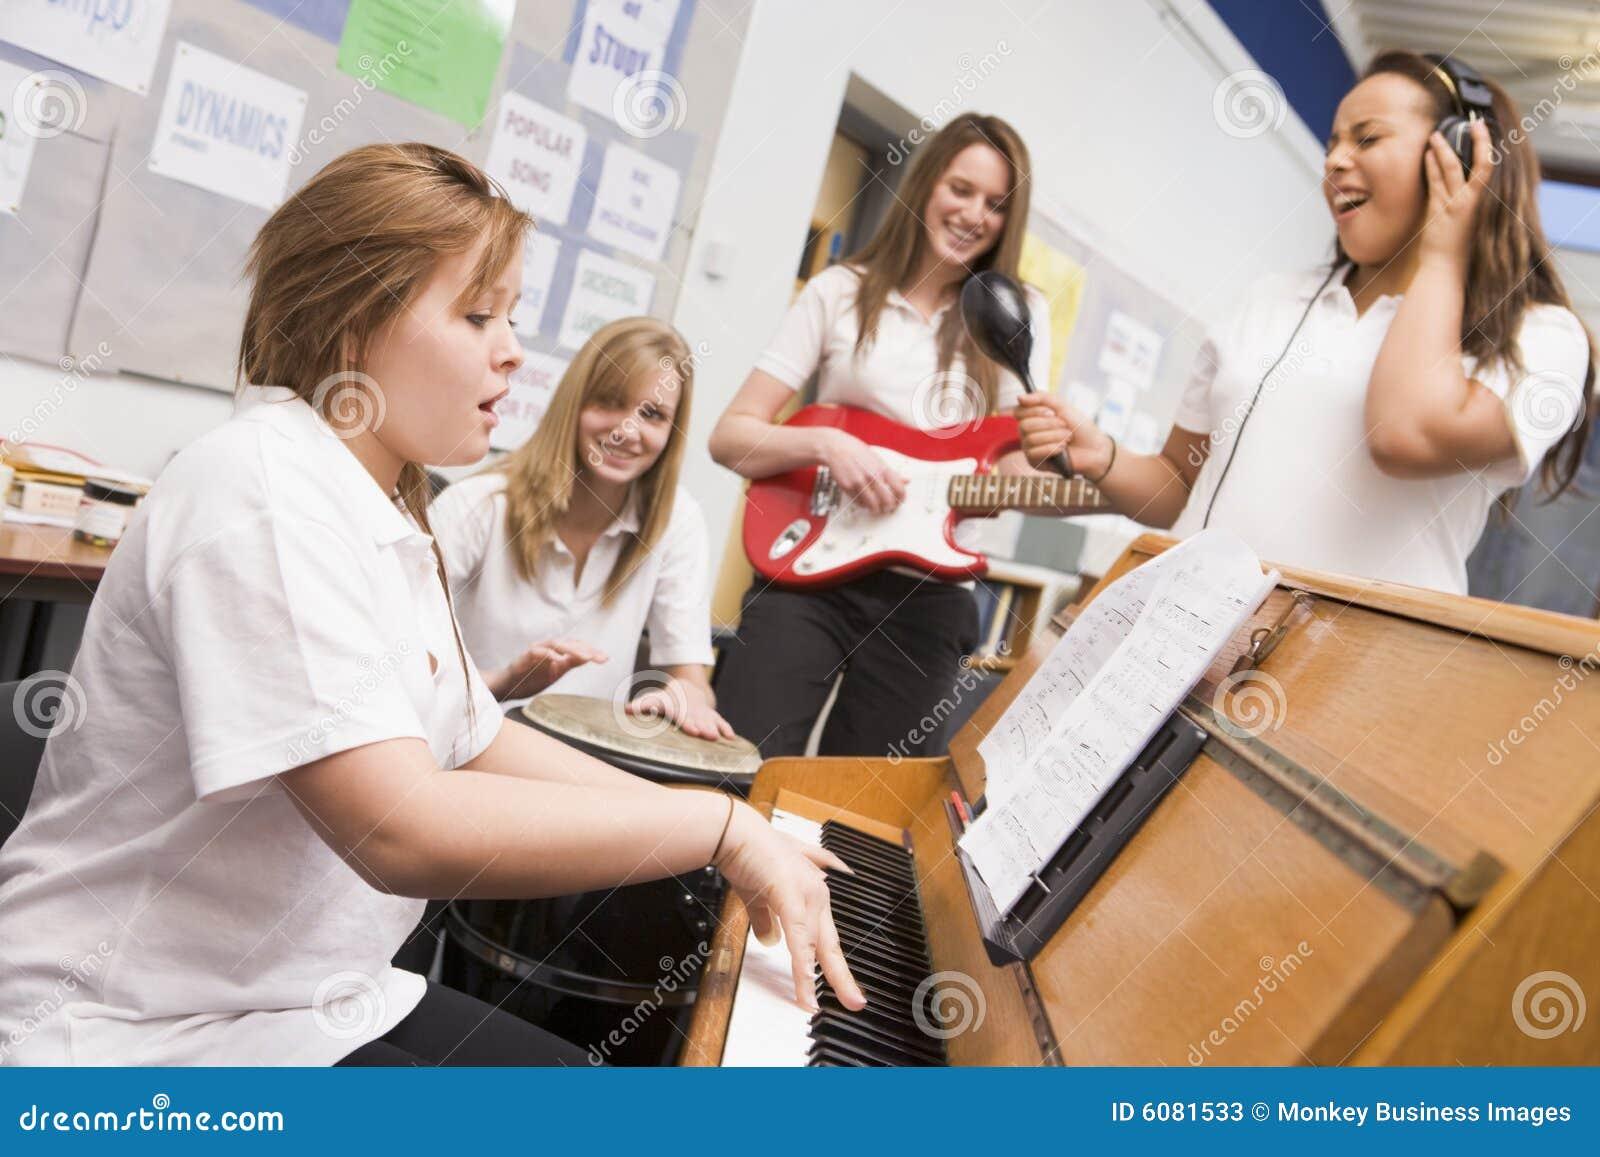 Schoolgirls playing musical instruments